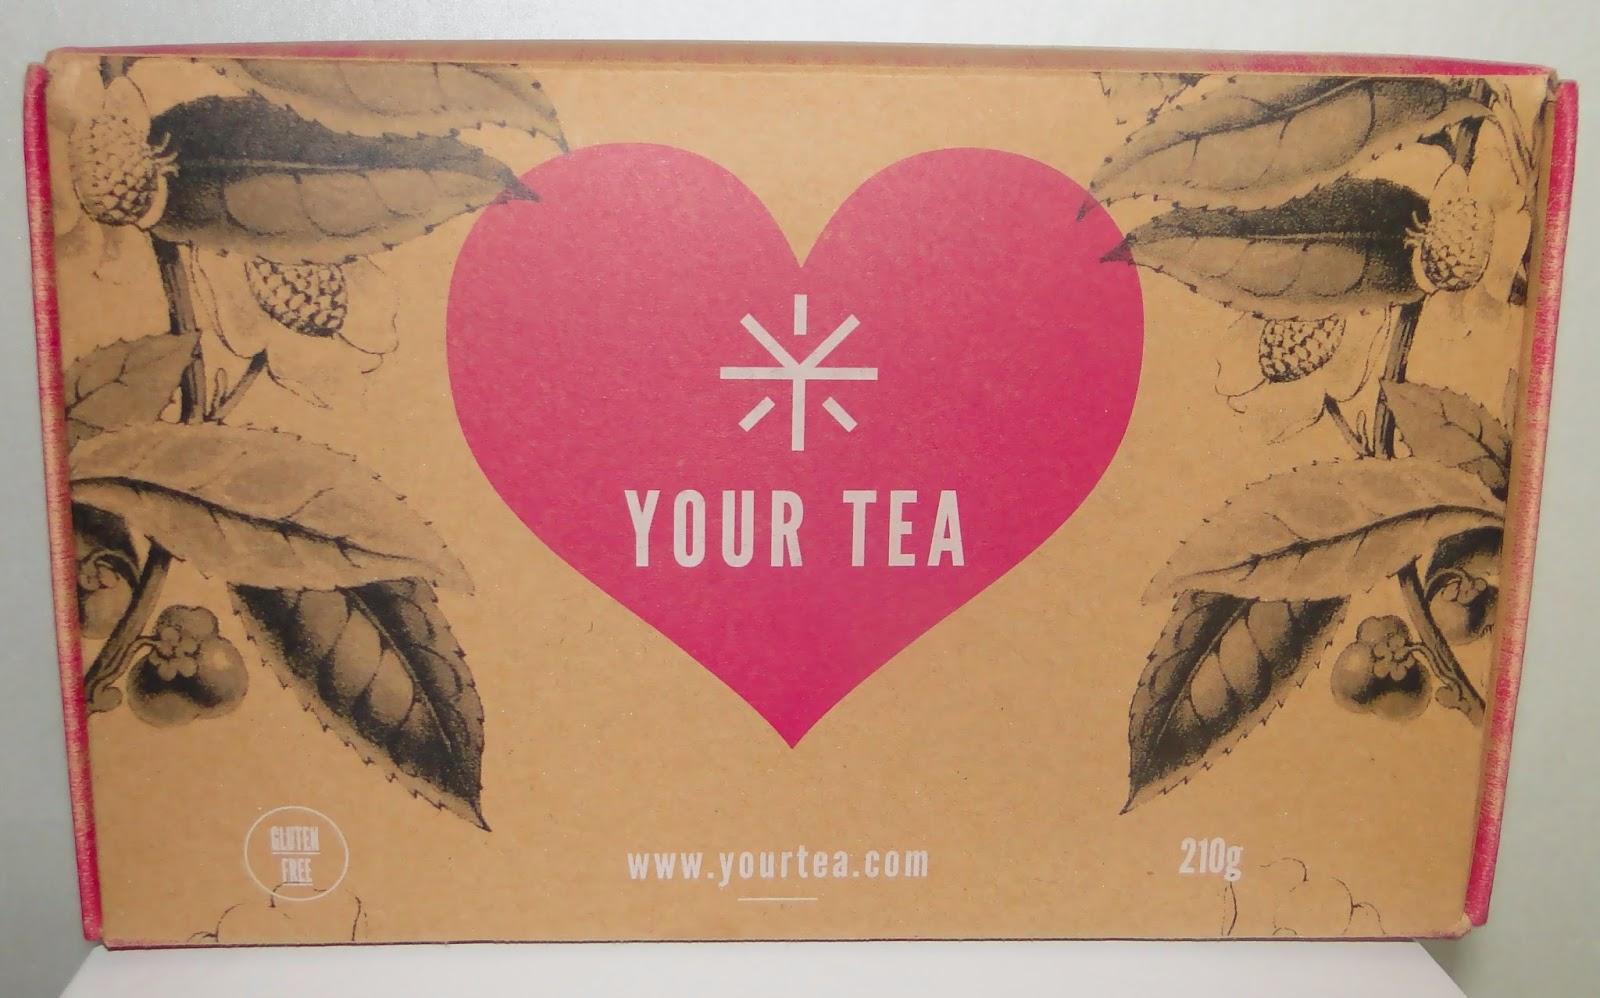 Tiny Tea, B Slim, Thé minceur, Maigrir, Régime, Your Tea